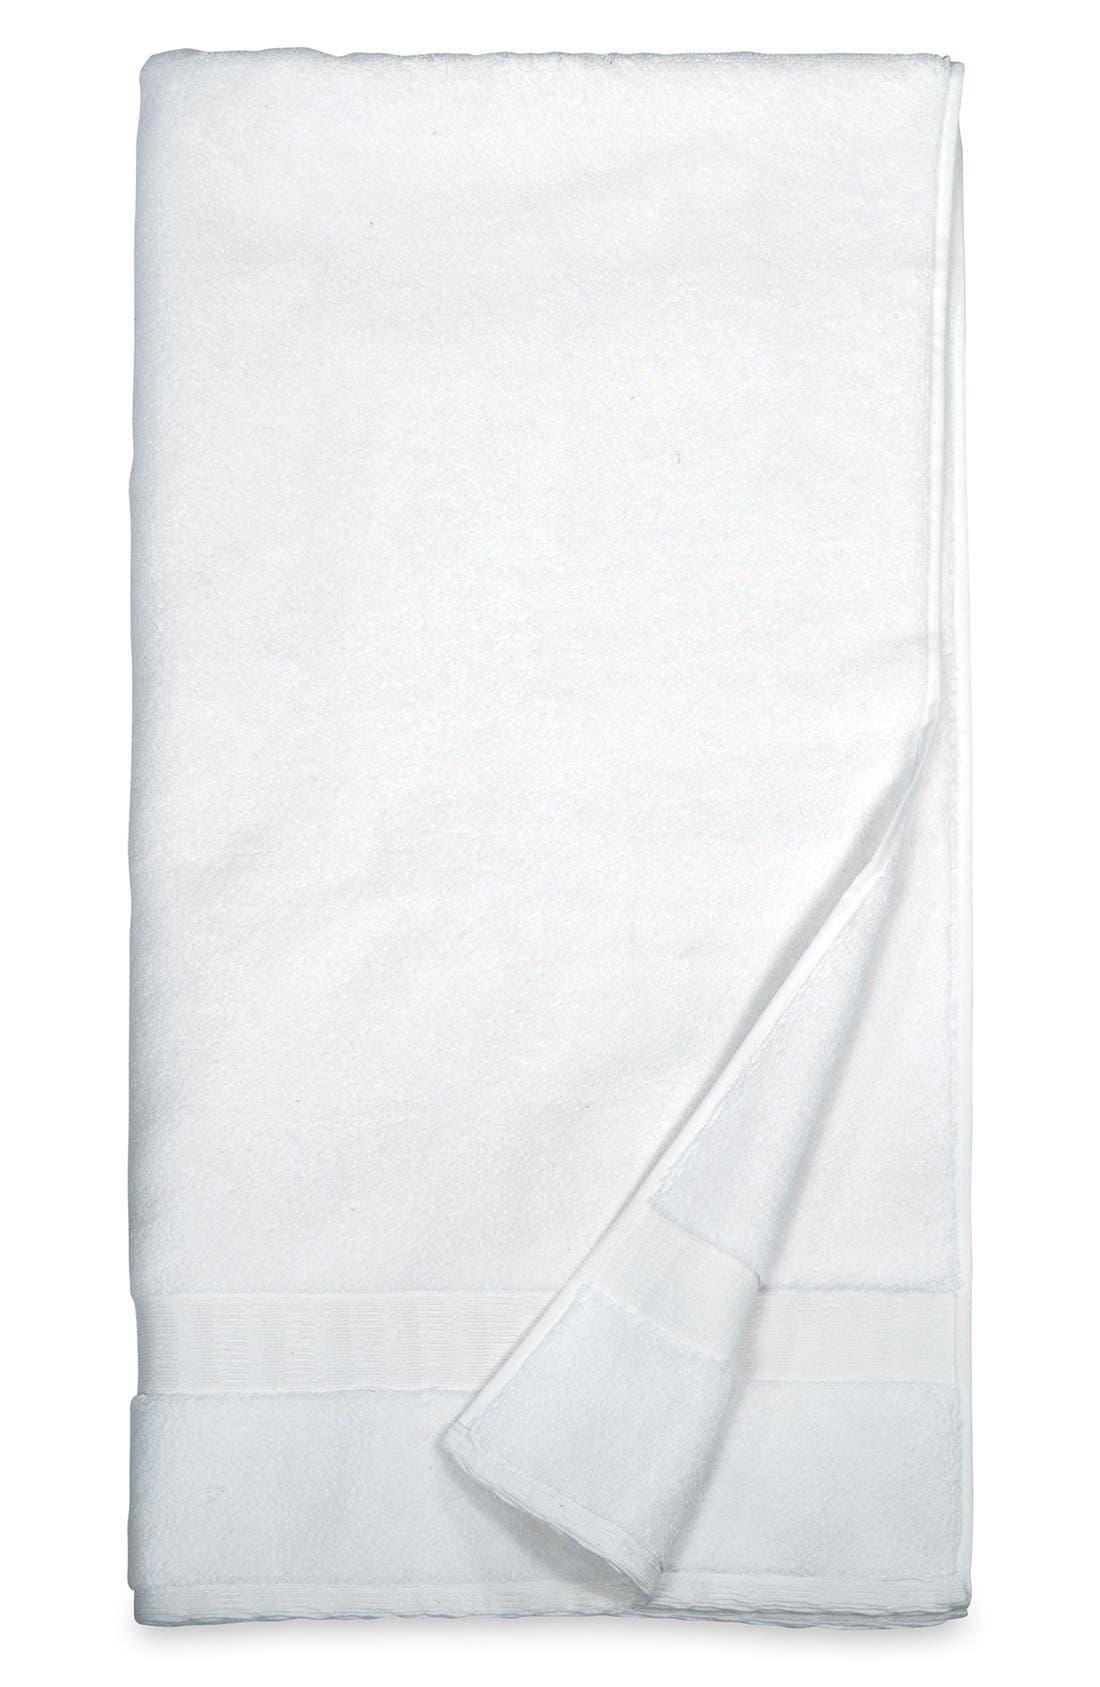 DKNY,                             Mercer Bath Sheet,                             Main thumbnail 1, color,                             WHITE